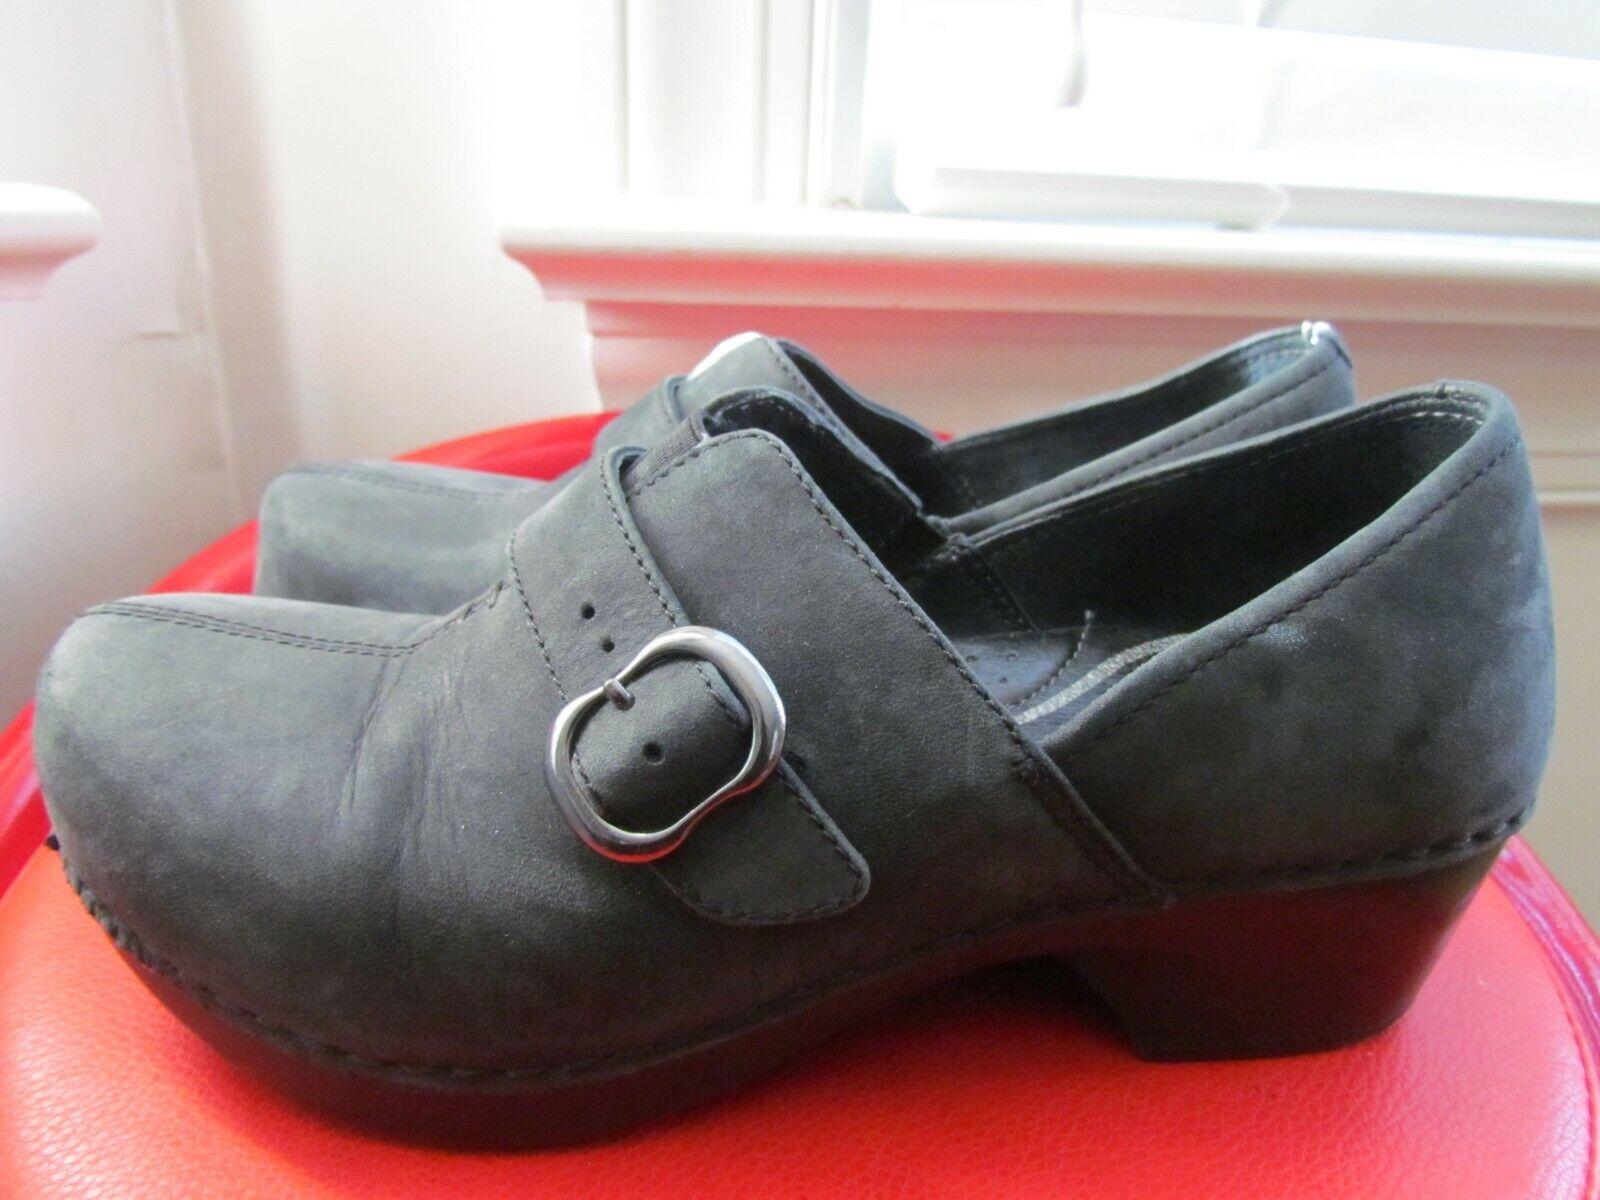 DANSKO BLACK LEATHER WOMEN'S CLOGS CLOGS CLOGS SIZE 36 (EUROPEAN) 7f2fa8